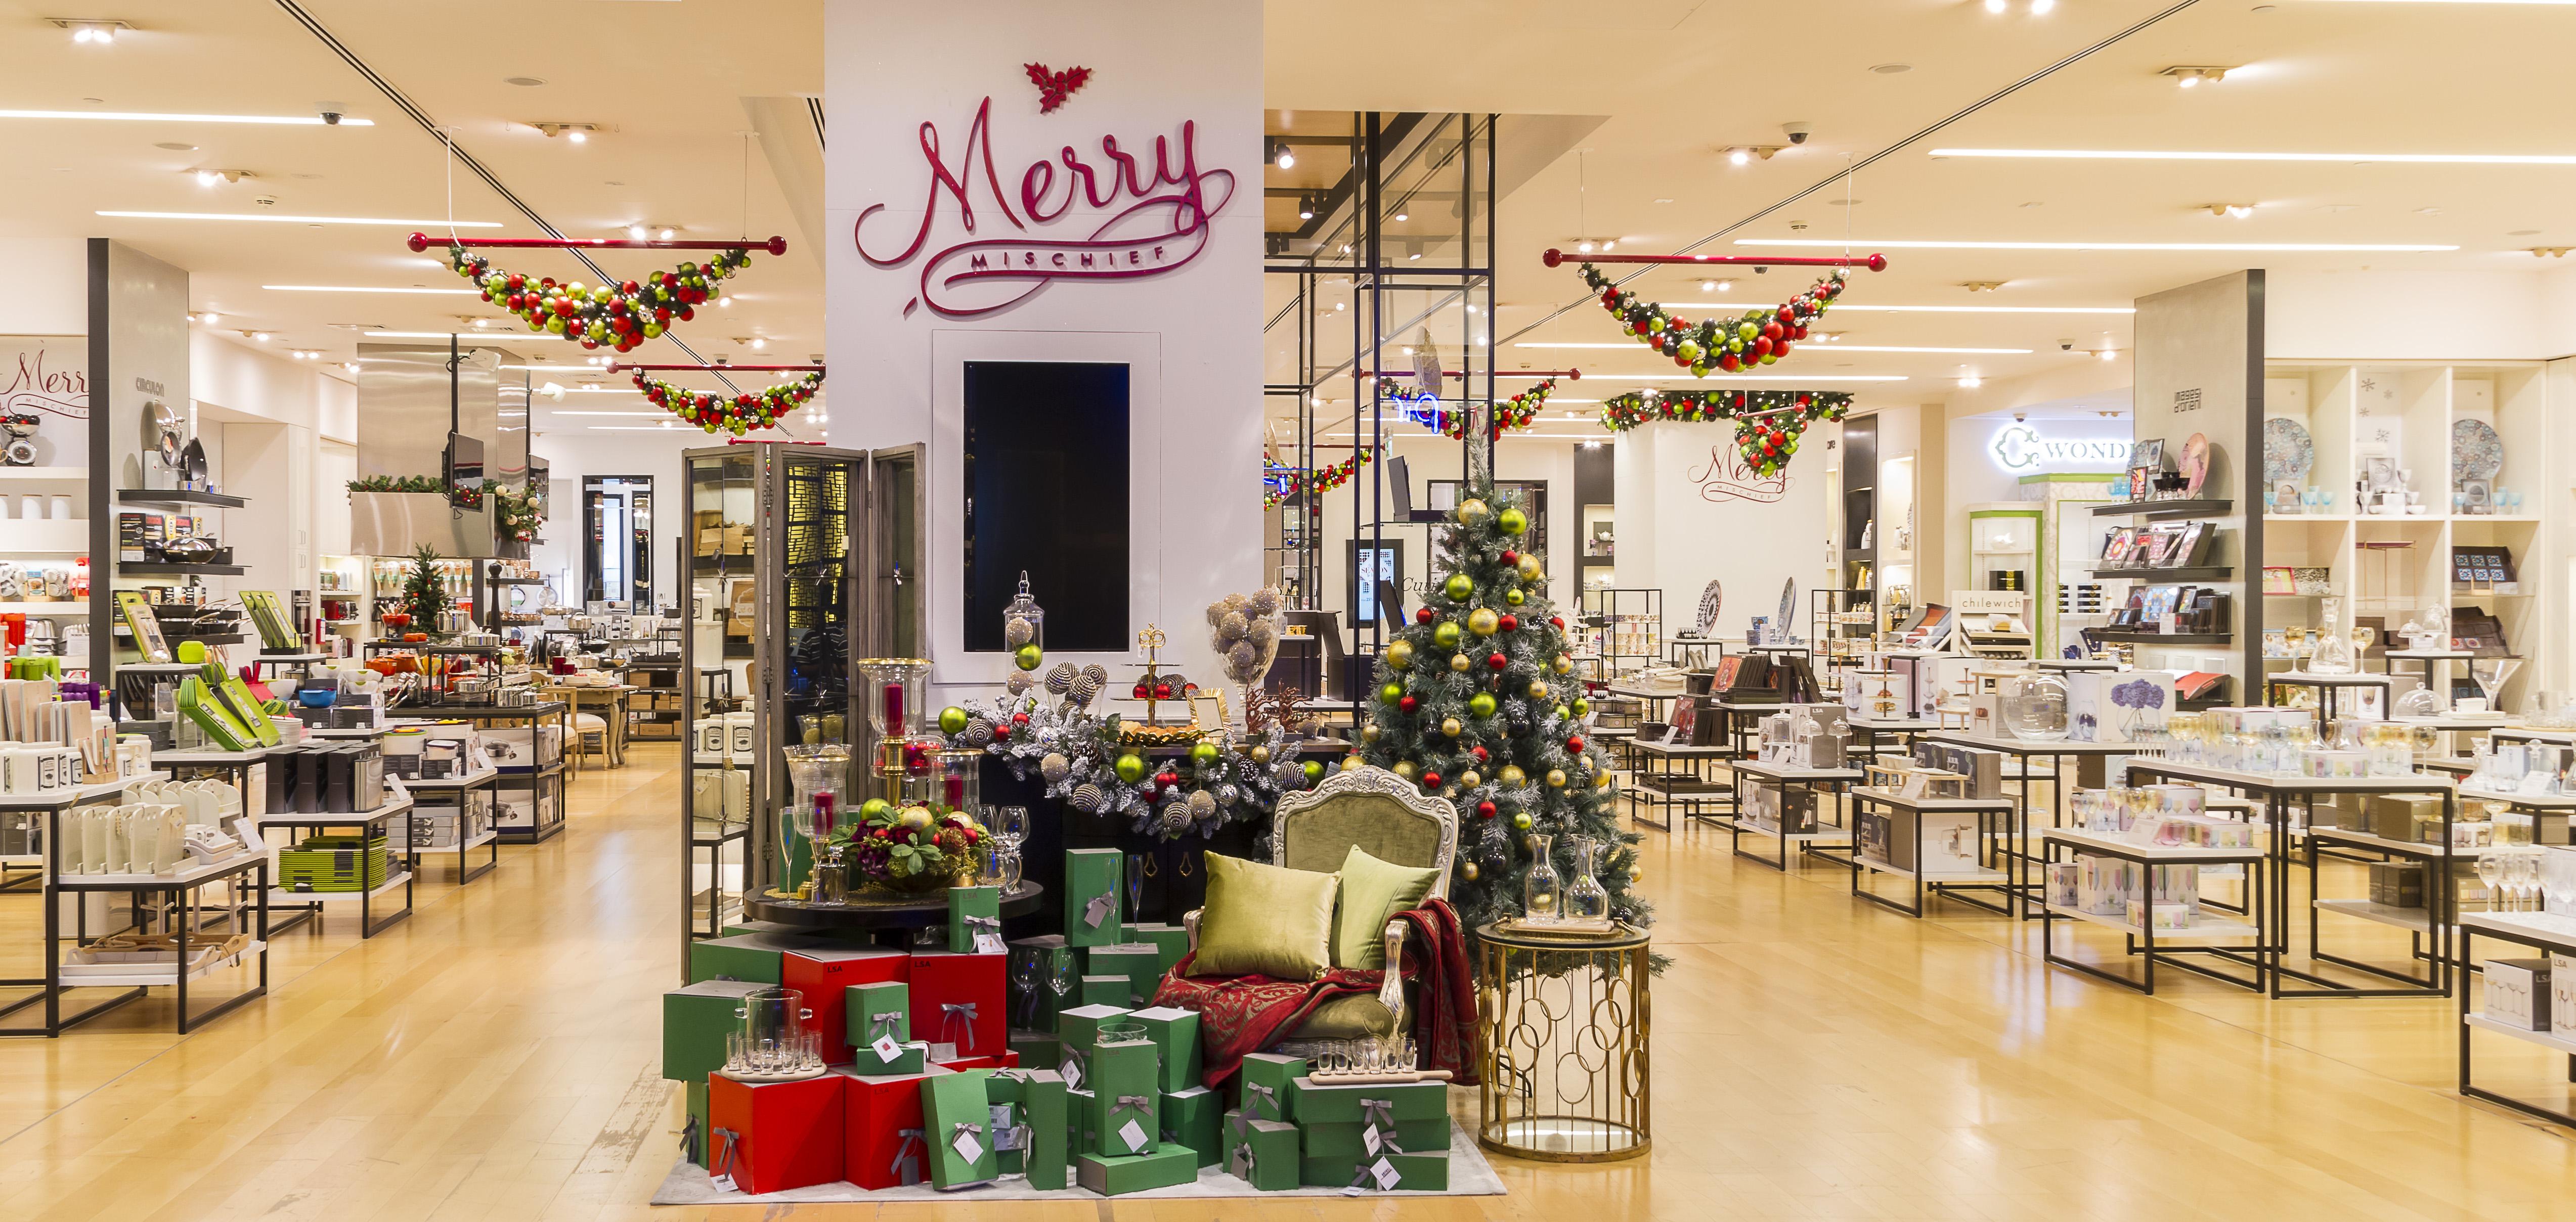 Merry Mischief at Bloomingdale's - Dubai